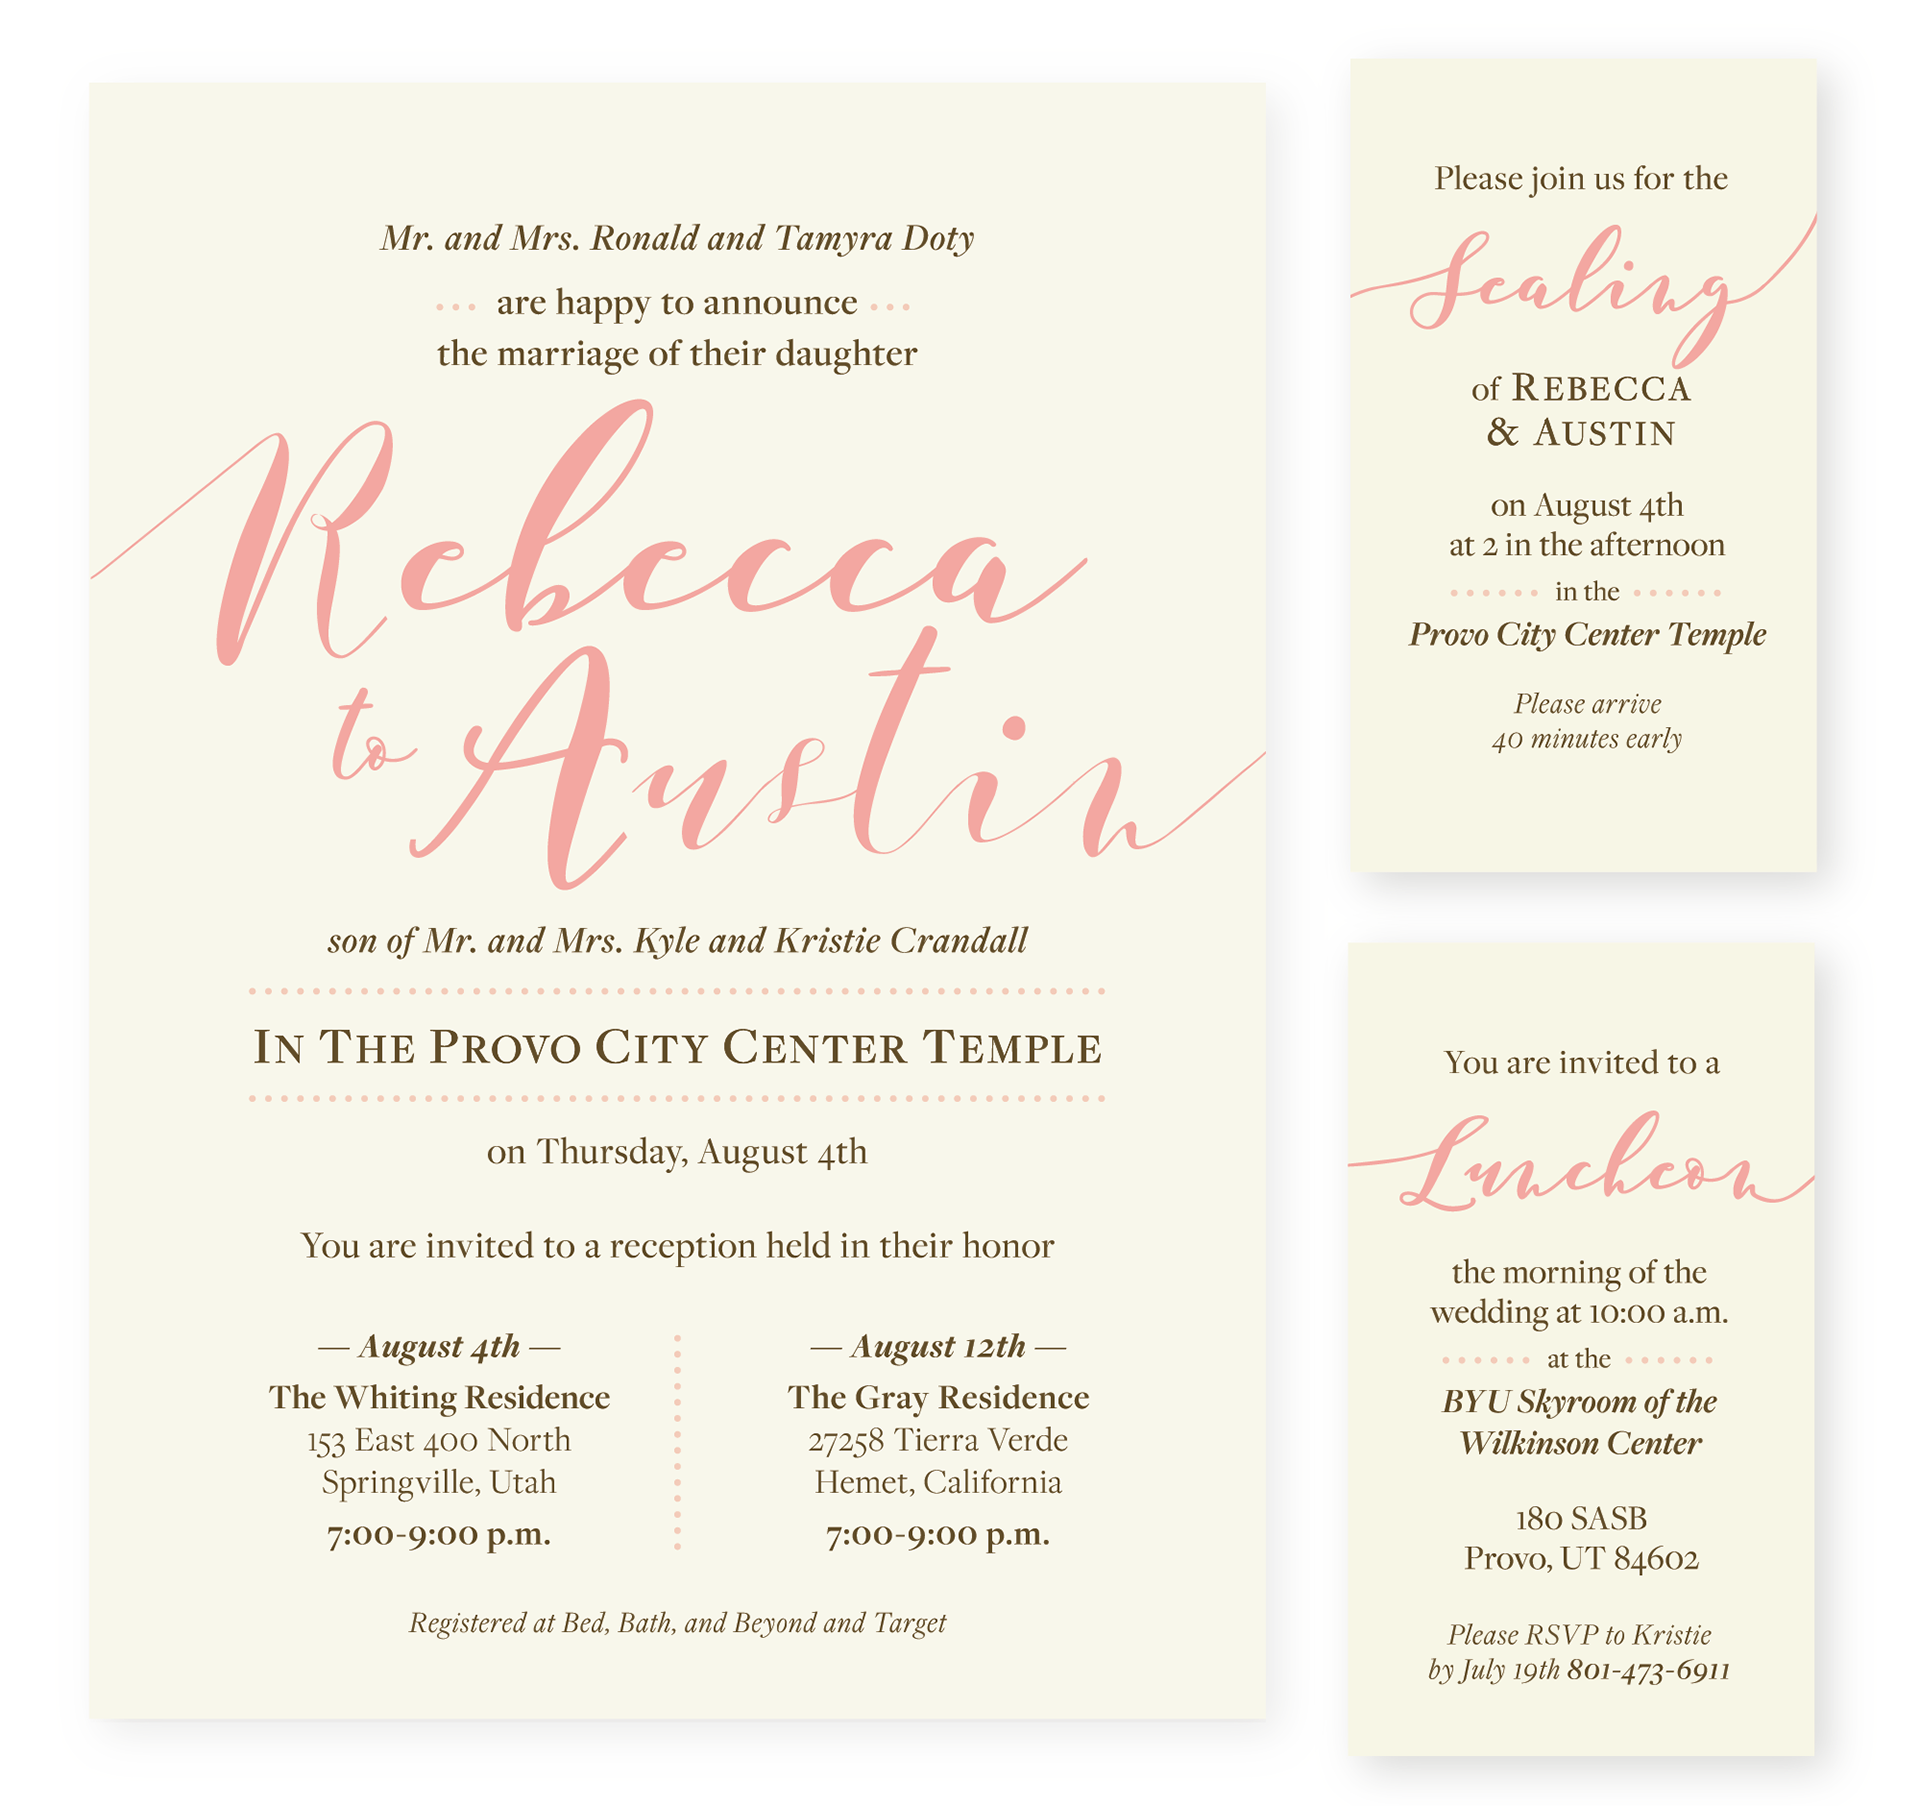 Kaylee dunn design simple classy sophisticated wedding invitation design monicamarmolfo Images